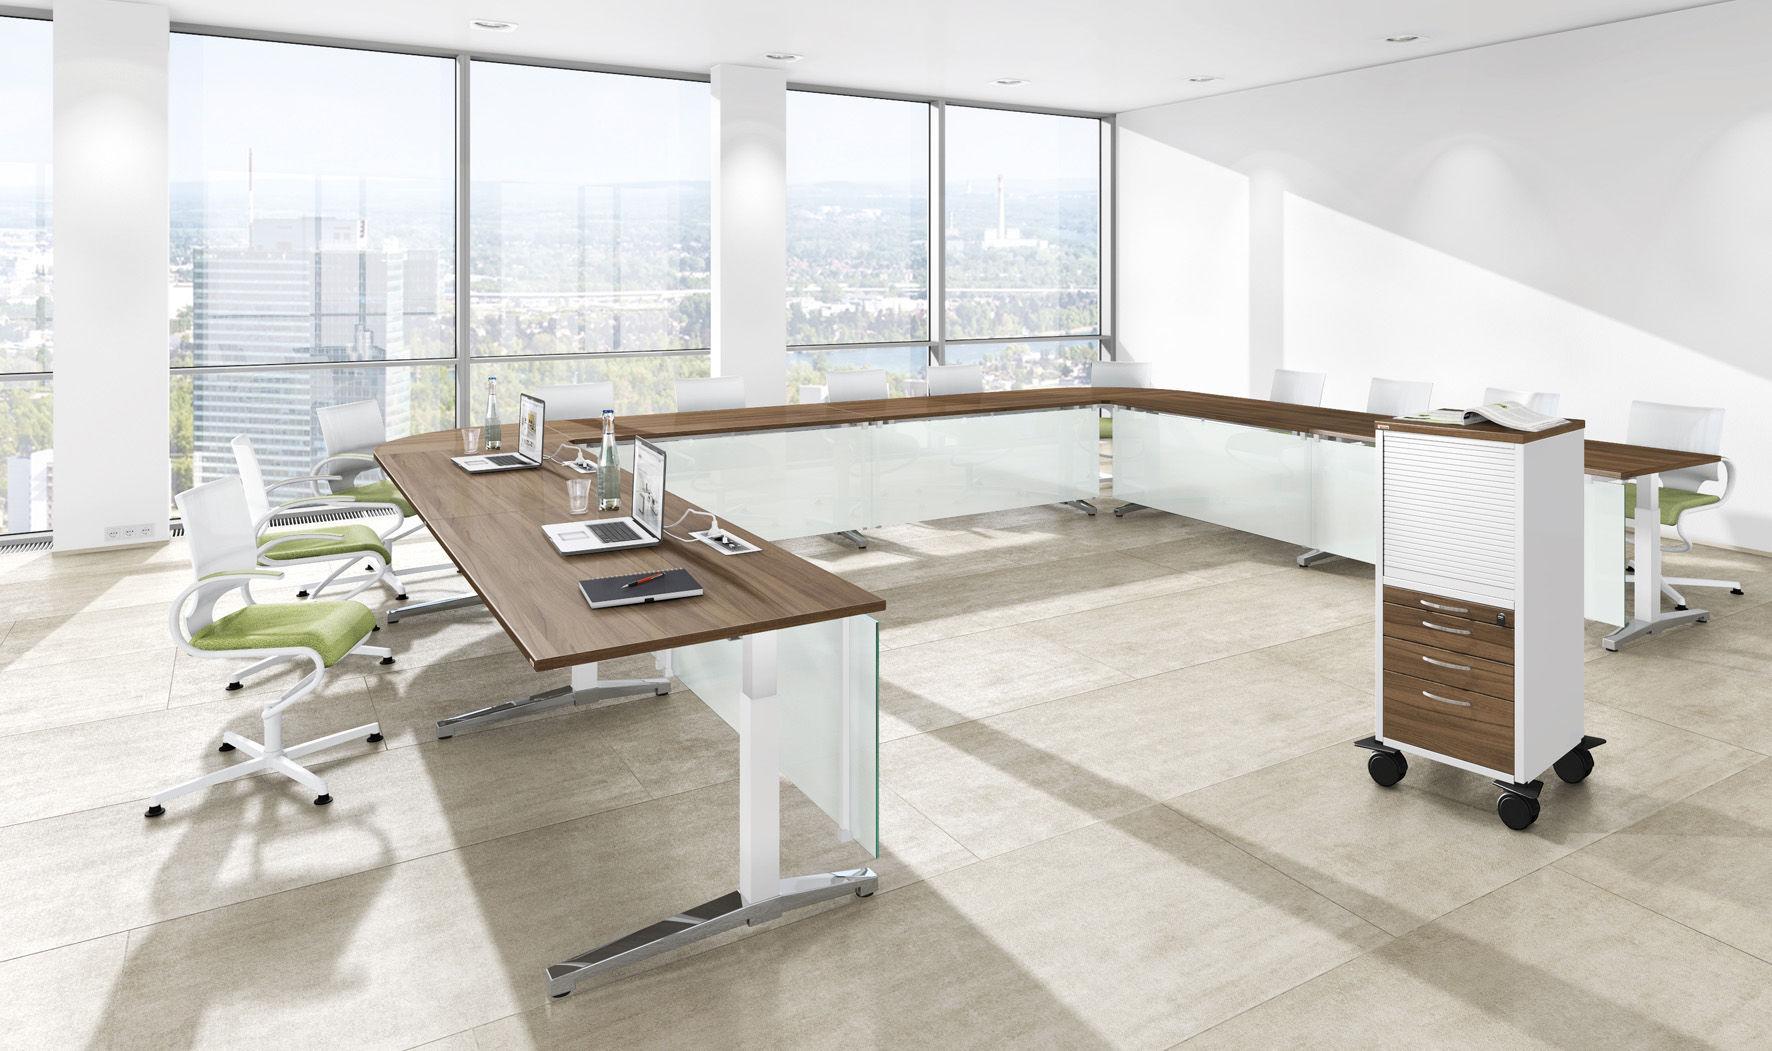 Moderne modulare büromöbel  Moderner Besprechungstisch / Holz / Metall / Melamin - CANVARO ...